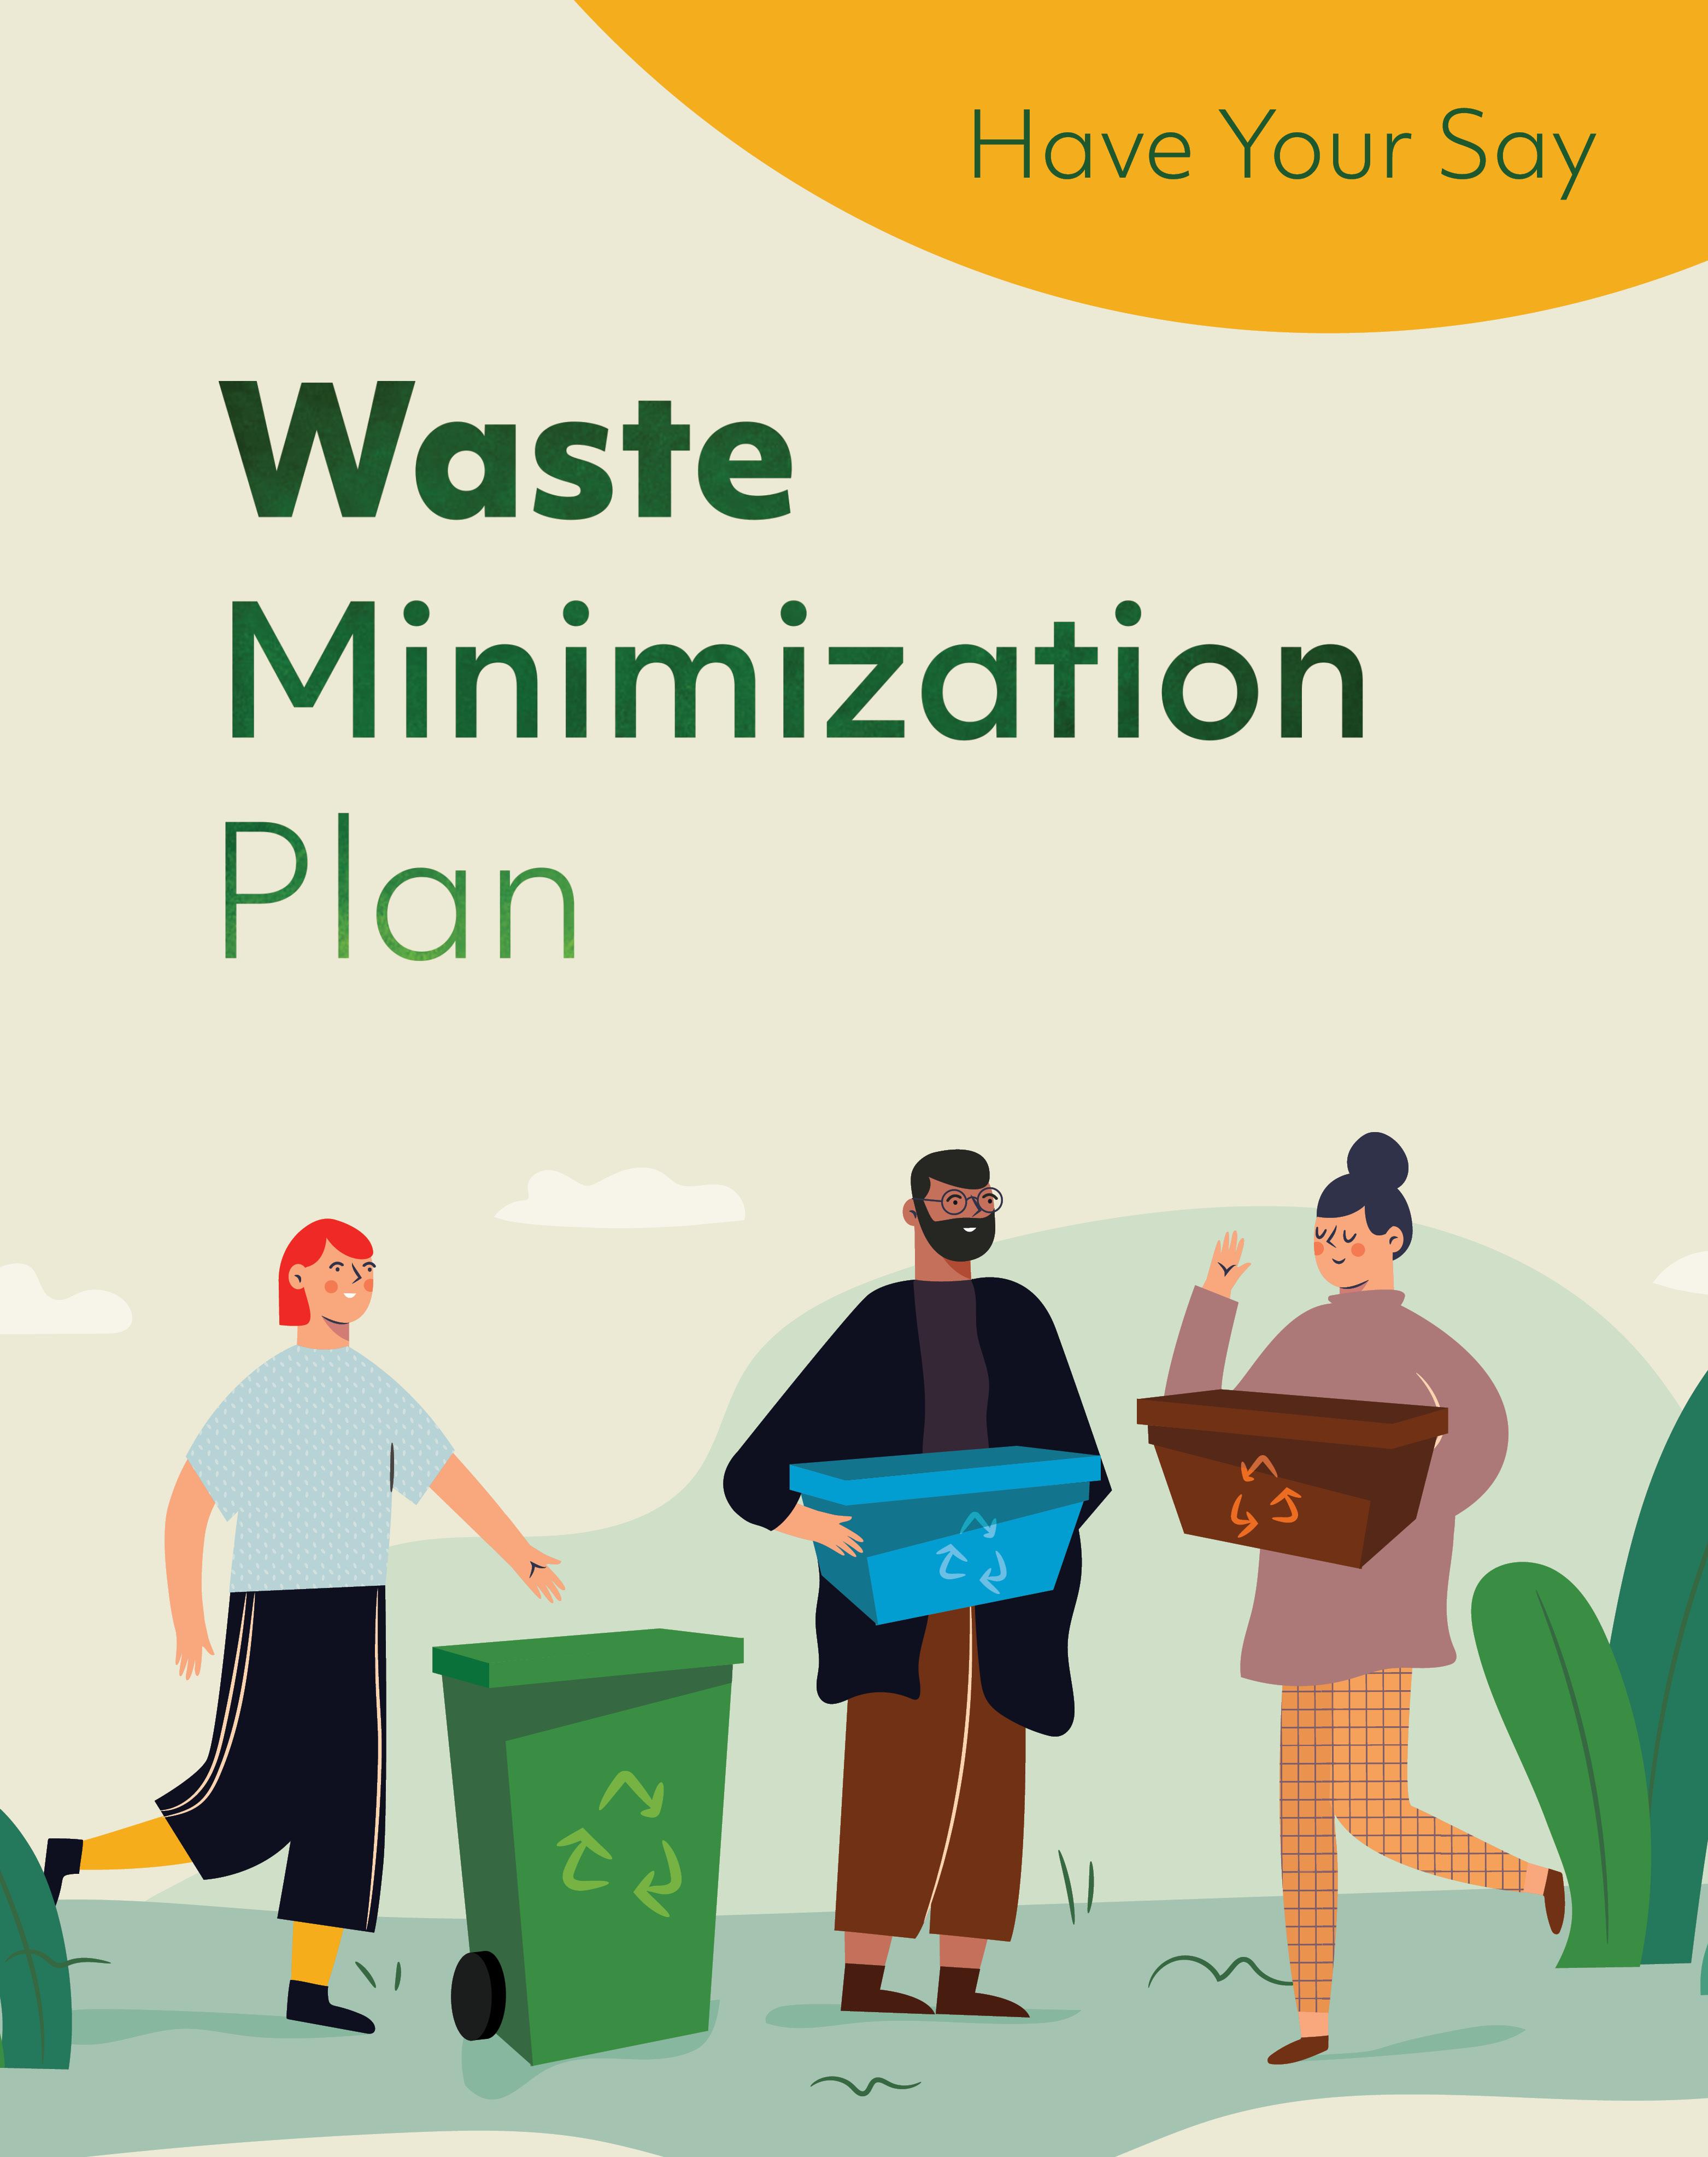 Waste Minimization Plan Post